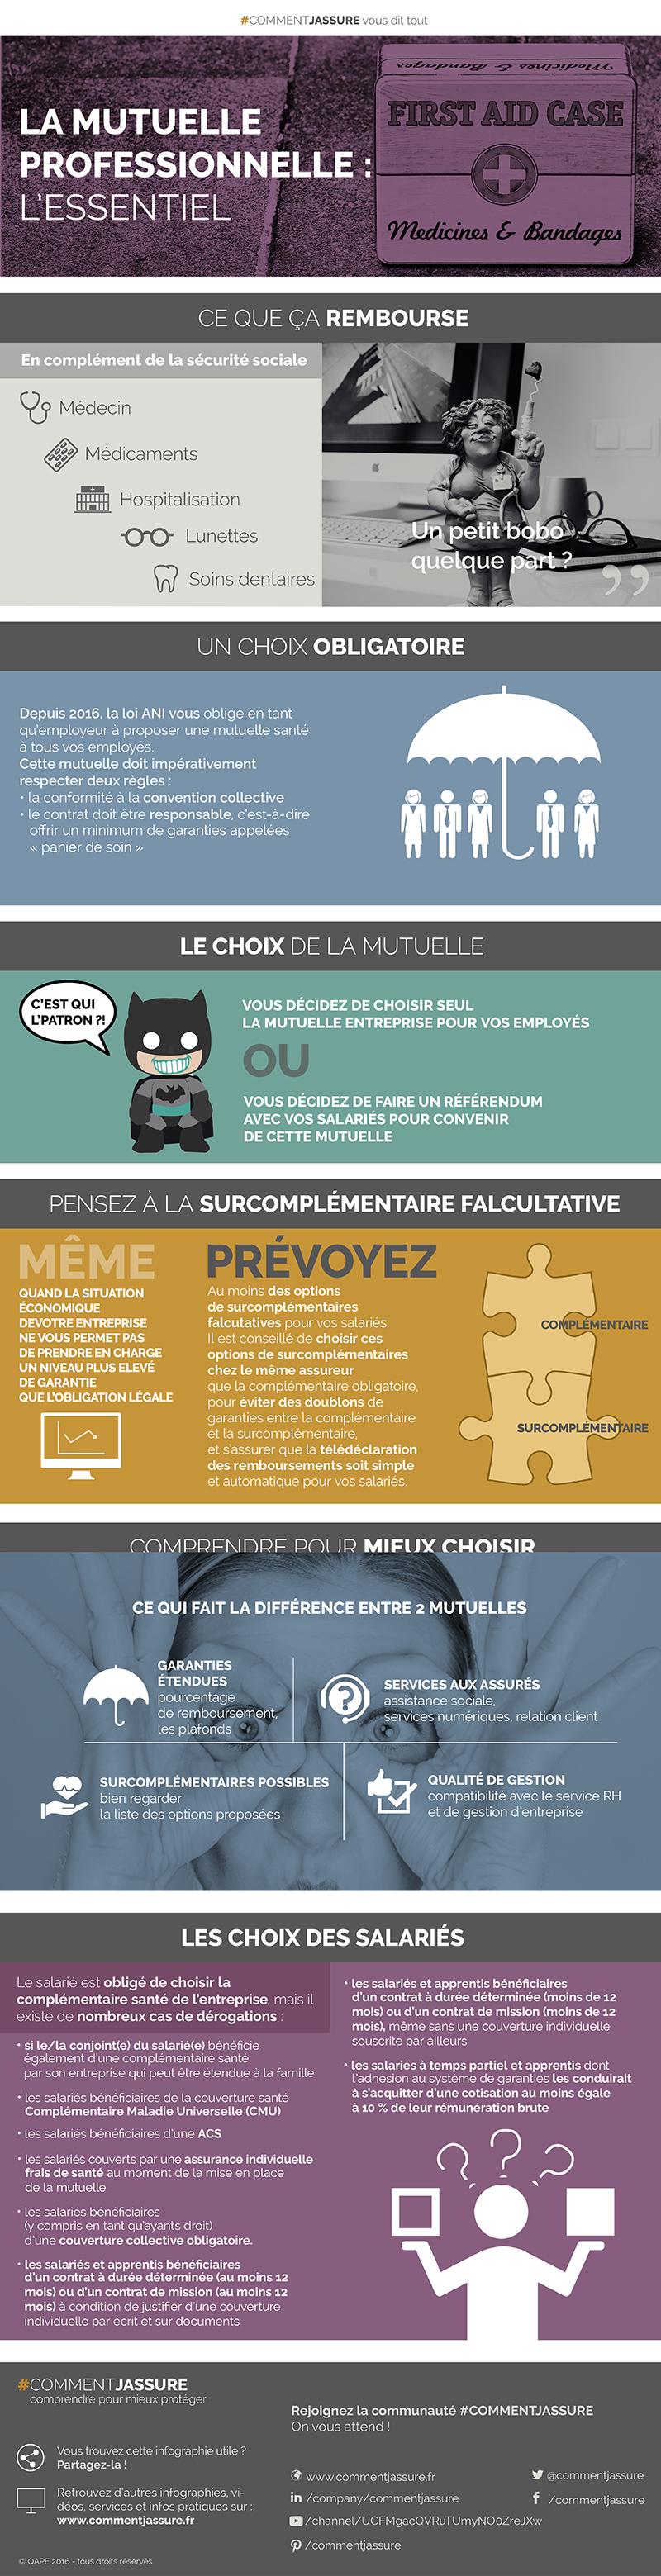 Infographie Mutuelle Pro l'Essentiel